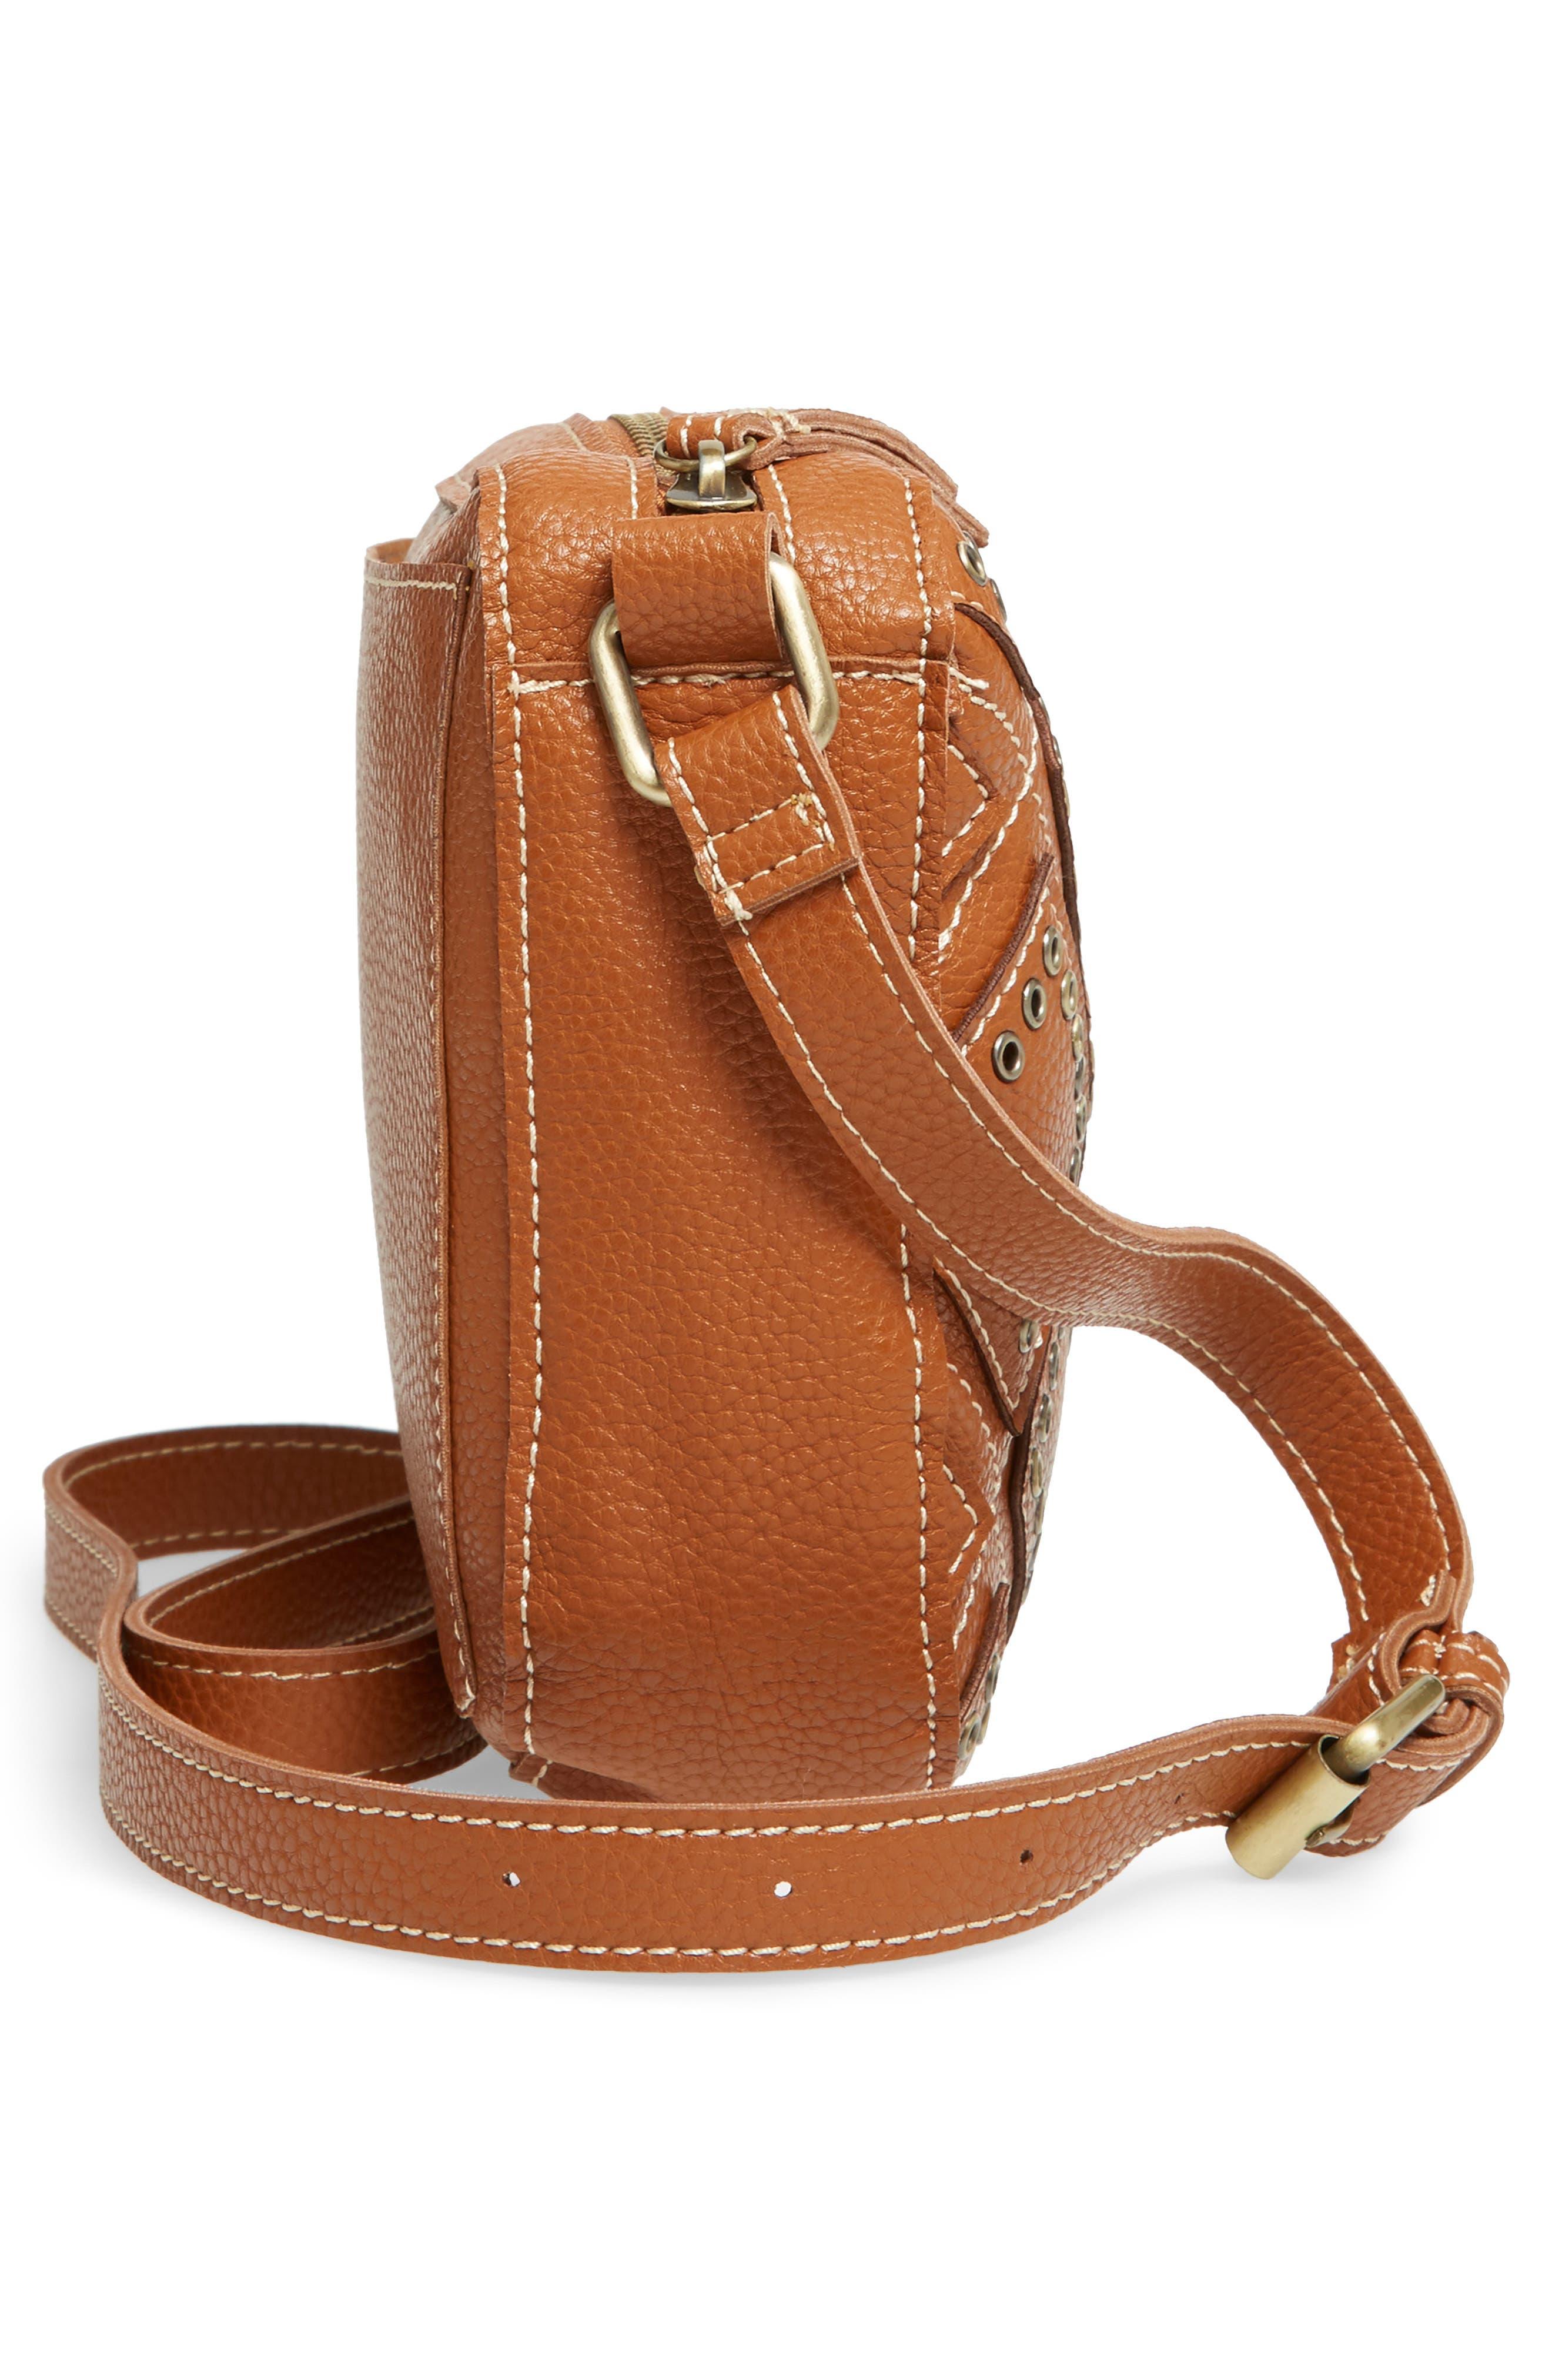 Skylar Faux Leather Crossbody Bag,                             Alternate thumbnail 3, color,                             Saddle